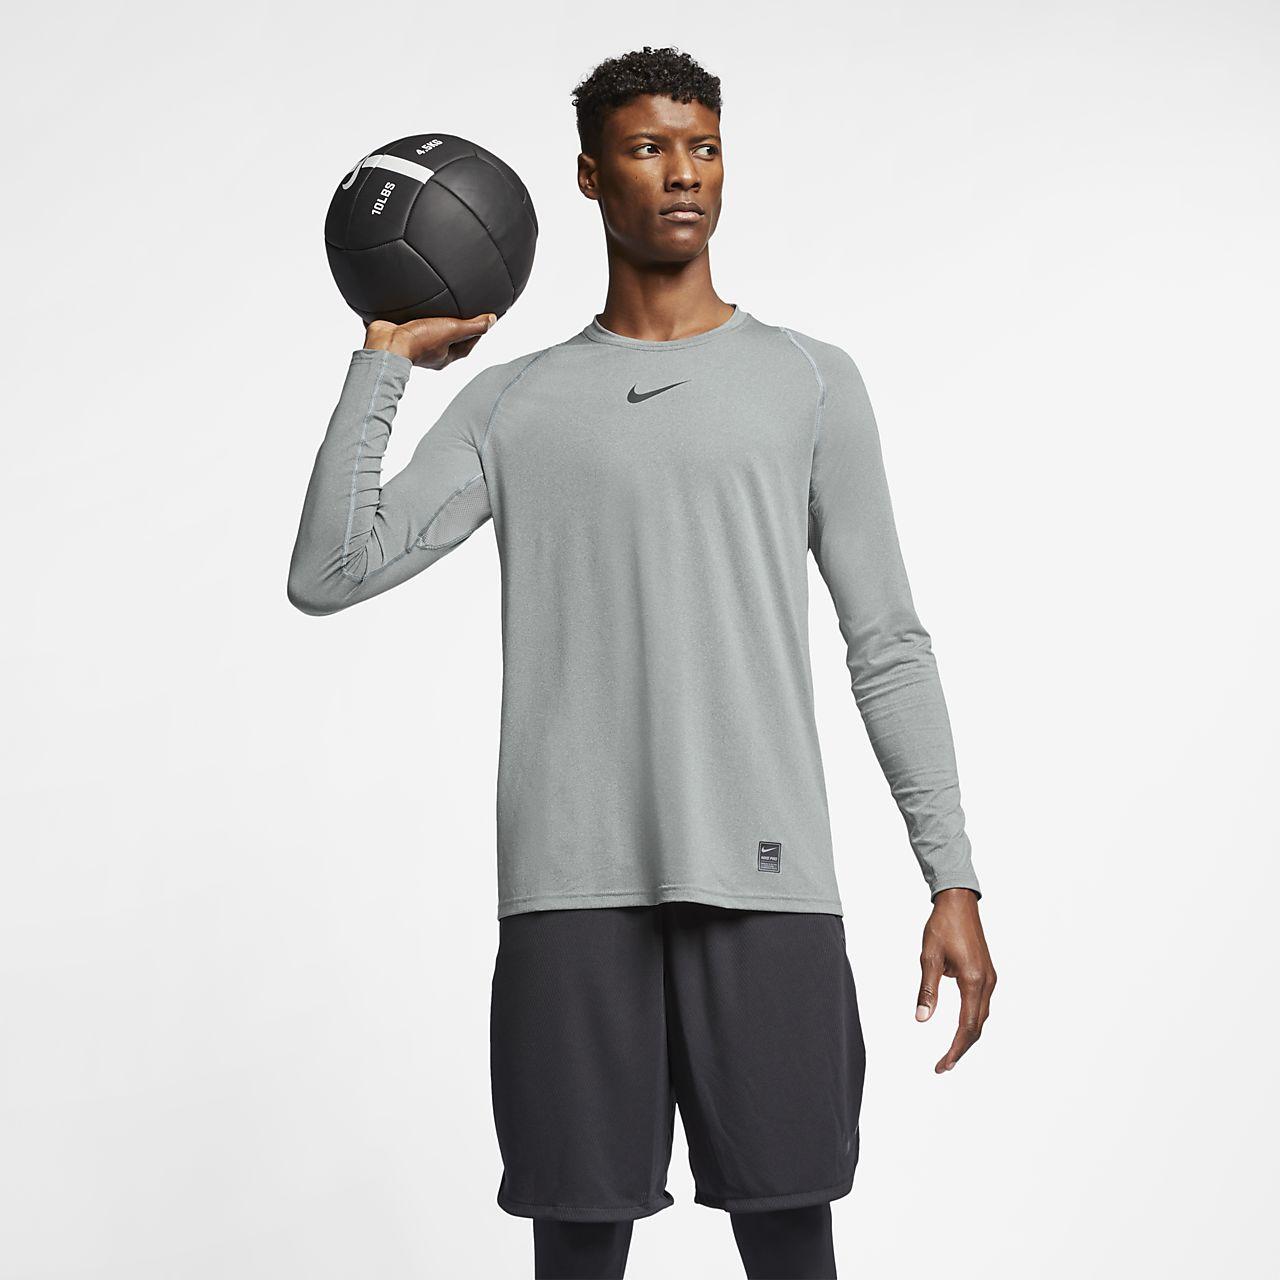 Pro long-sleeve top - Black Nike Huge Surprise Sale Online 3PuqC